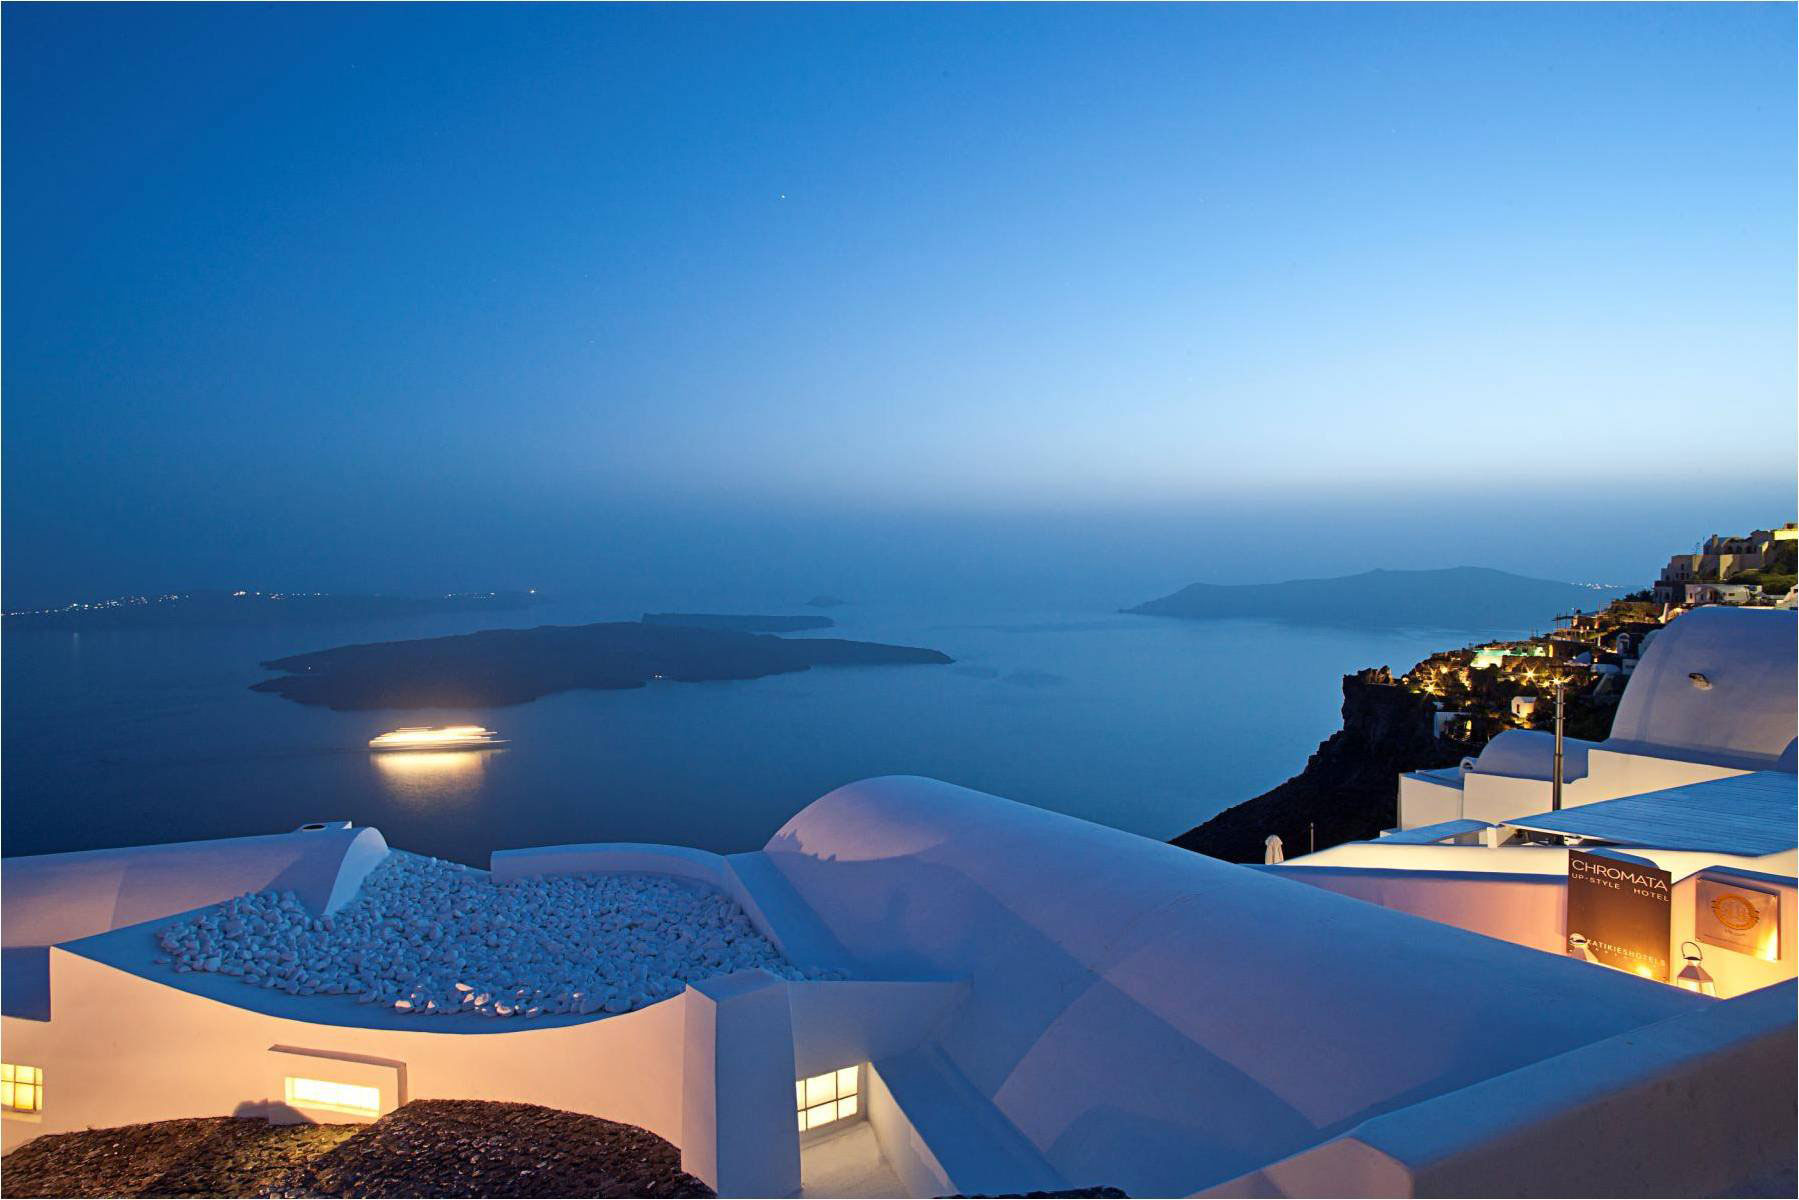 Greece Wallpaper Hd Katikies Hotels In Oia Architecture Amp Design